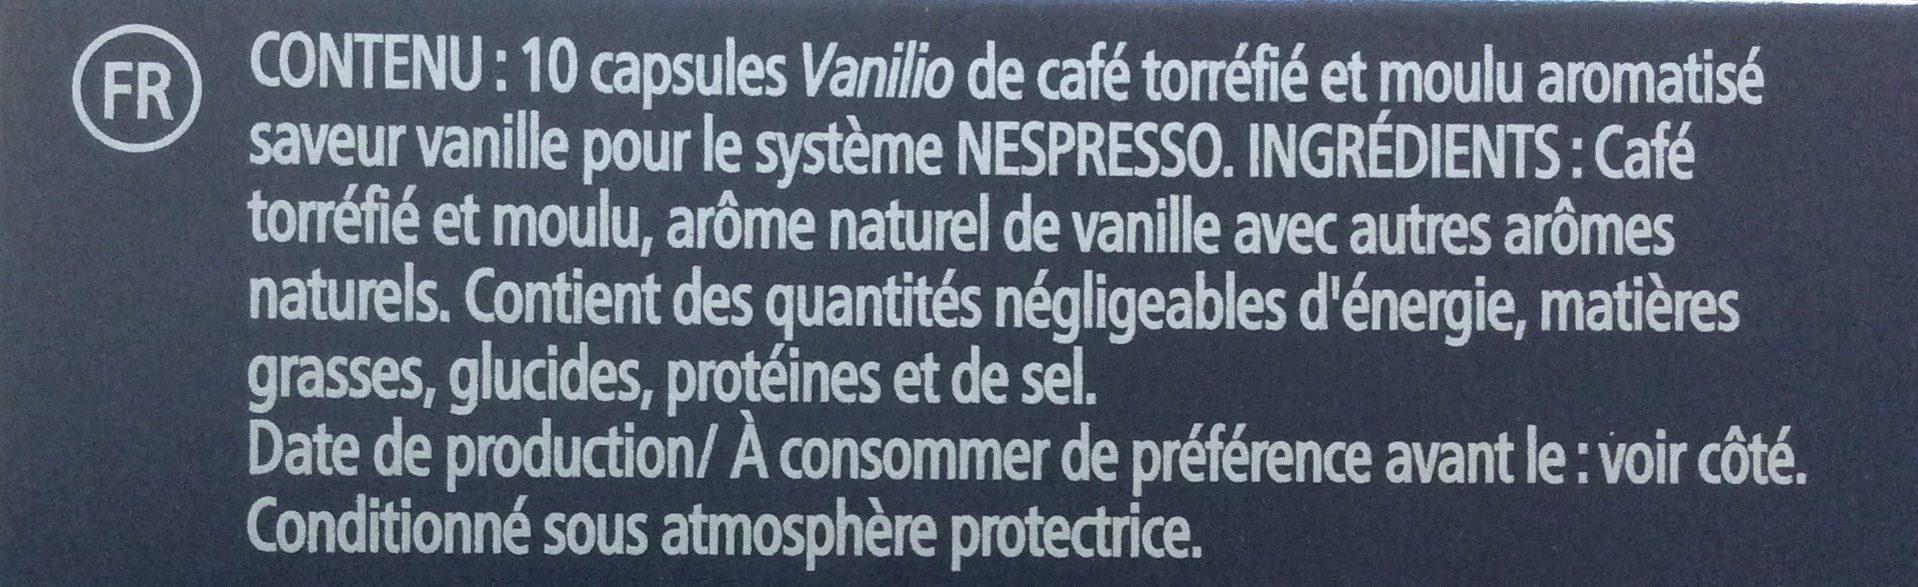 Vanilio Variations - Ingrediënten